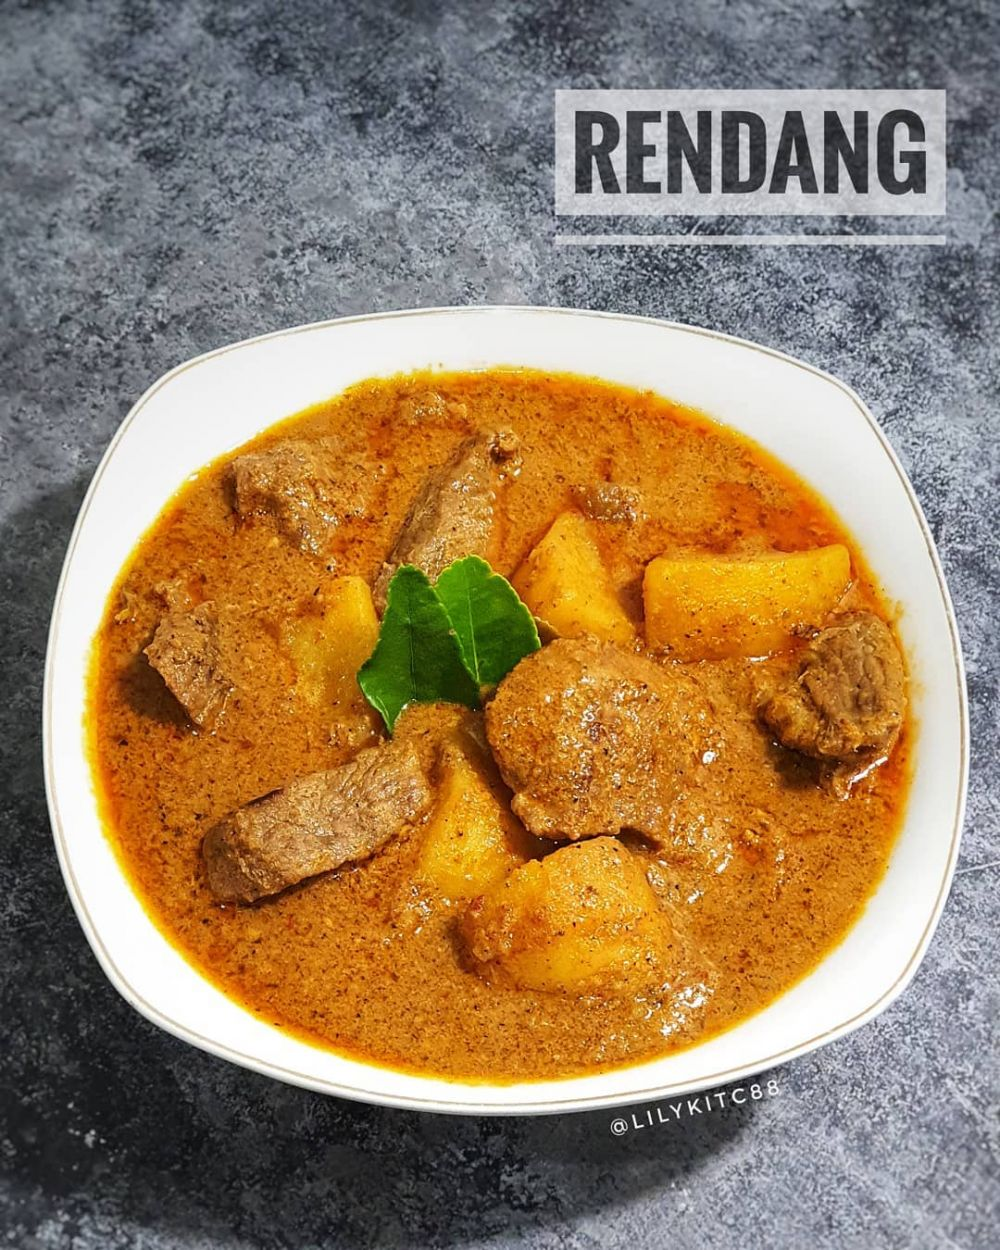 17 Resep masakan lebaran © 2020 Instagram/@nenipuspit ; Instagram/@banususanto